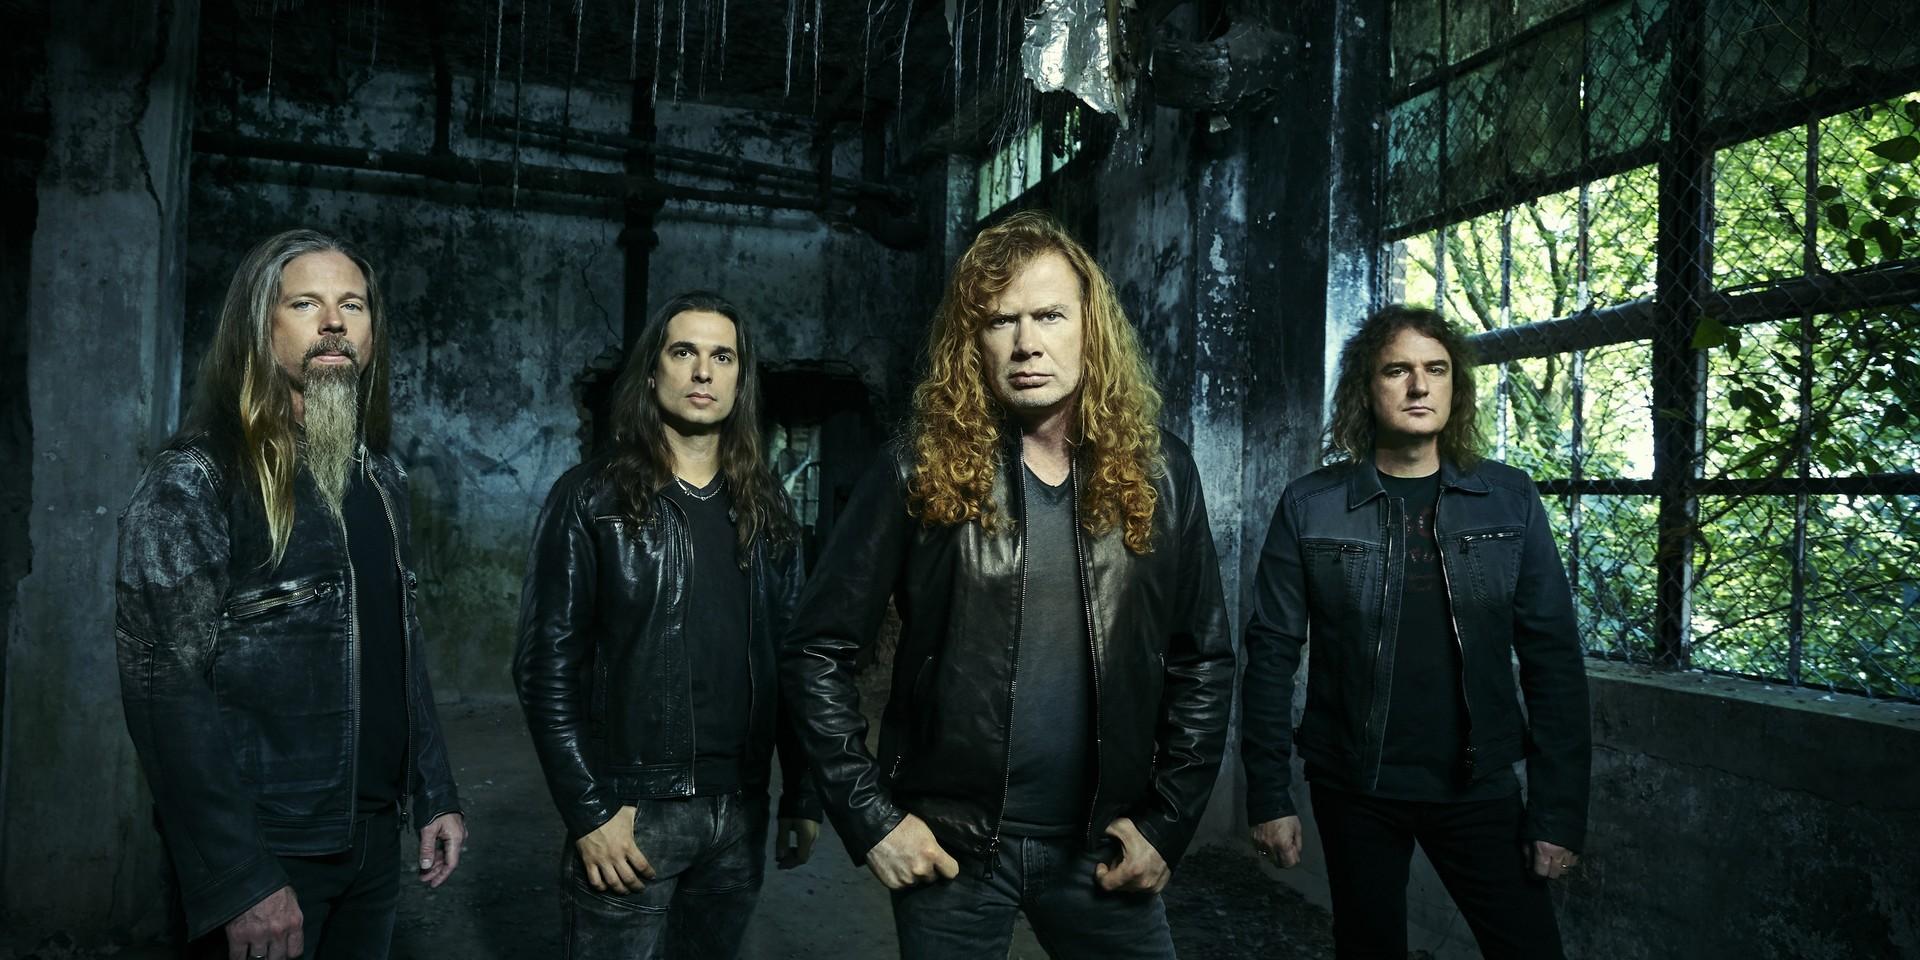 Megadeth is in the studio recording their next album